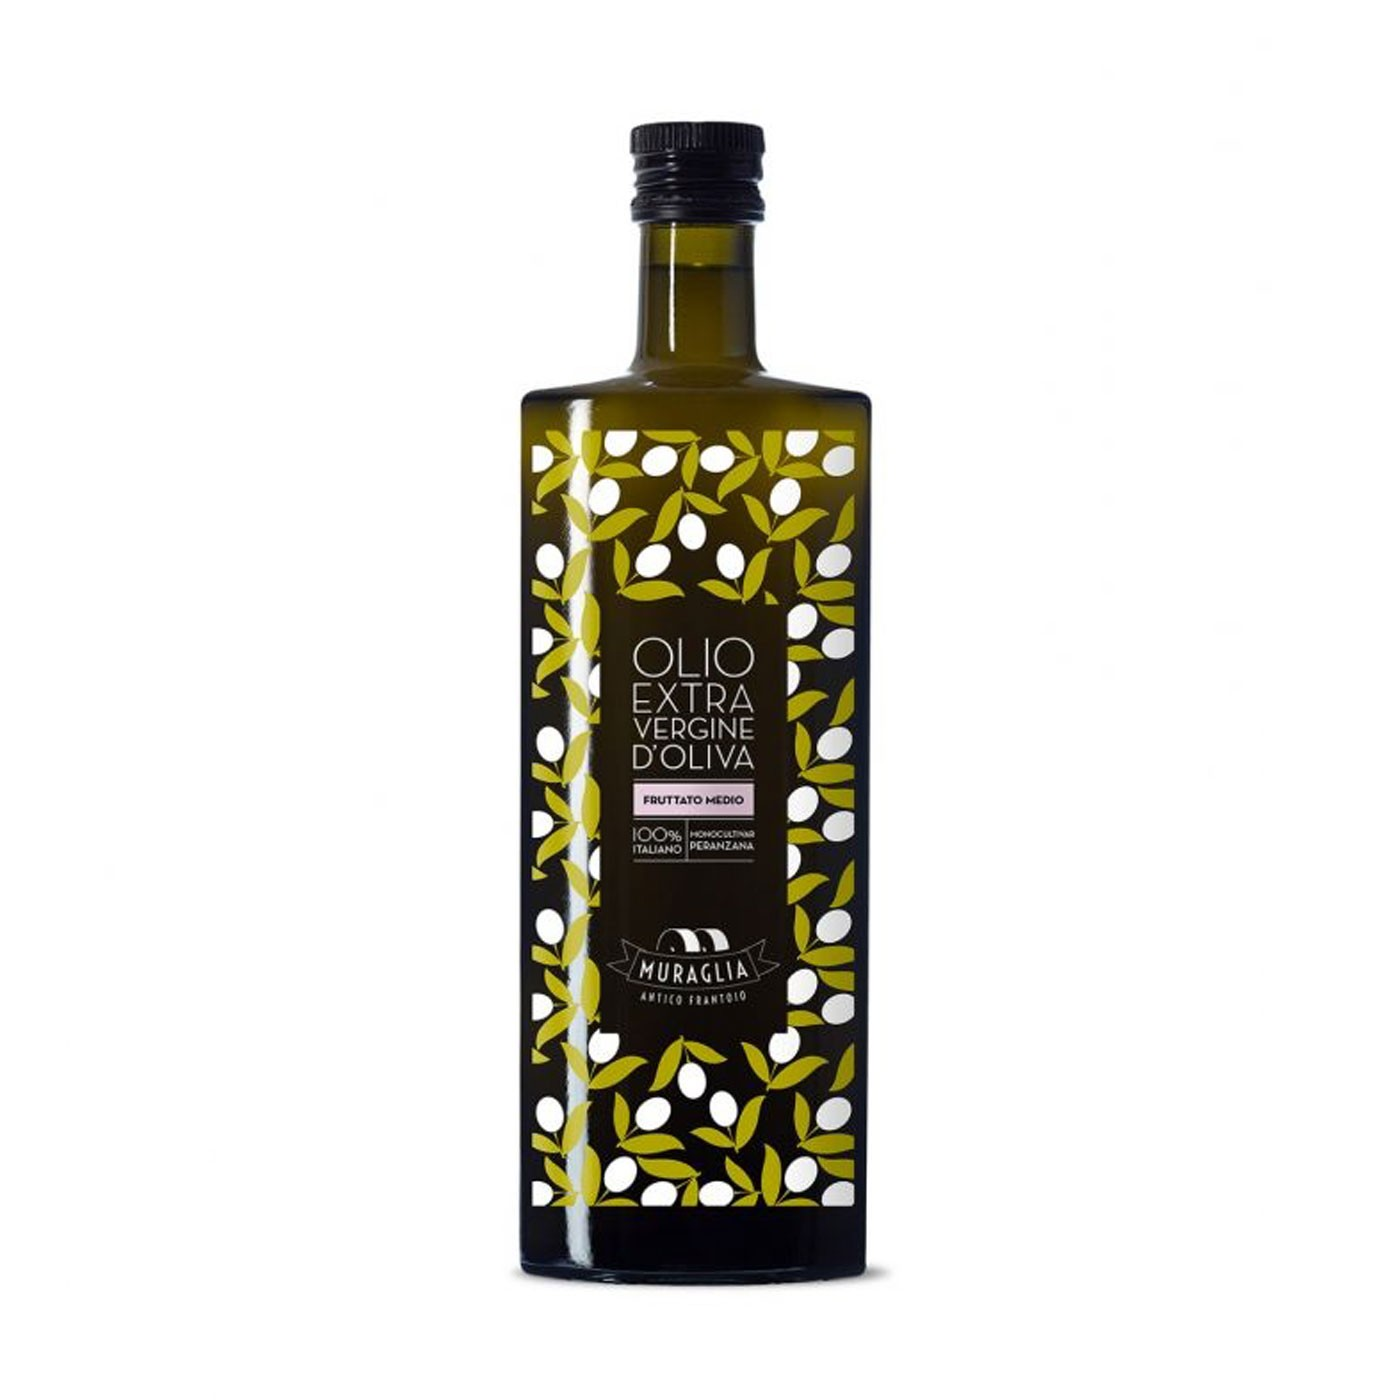 Peranzana Essence Medium Extra Virgin Olive Oil 16.9 oz